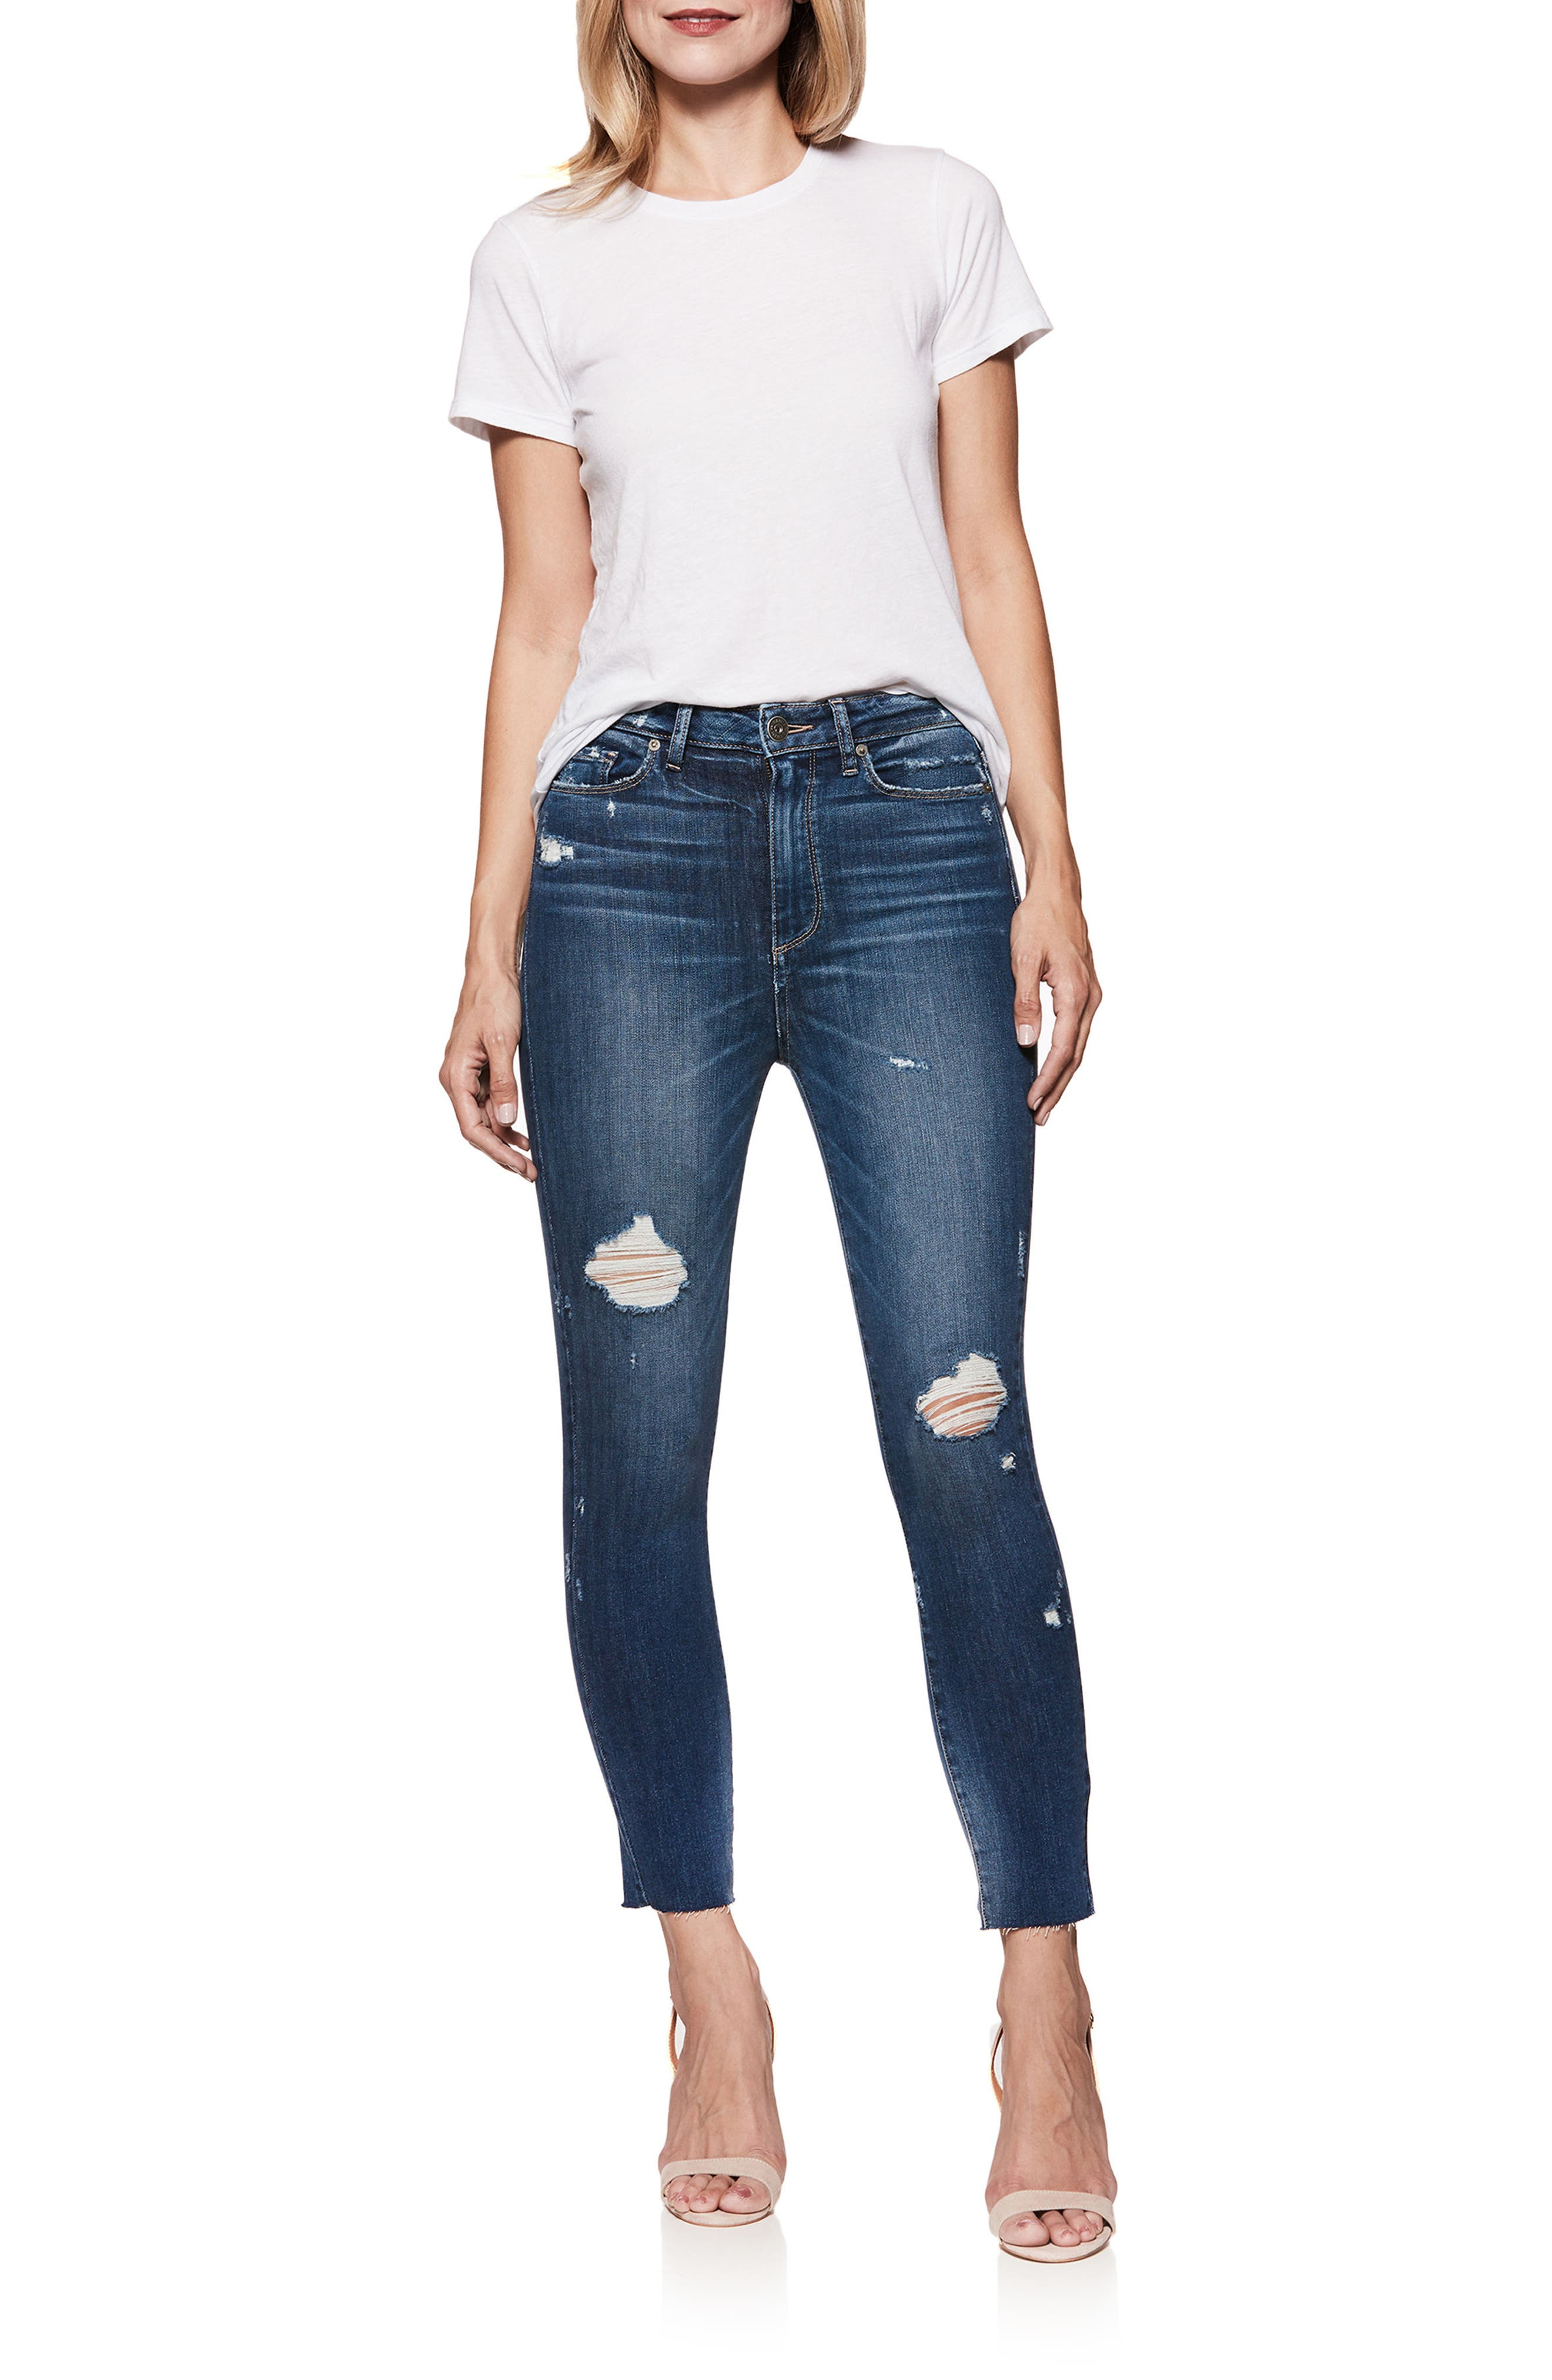 Transcend Vintage - Margot High Waist Crop Skinny Jeans,                             Alternate thumbnail 2, color,                             Cliffs Edge Destructed